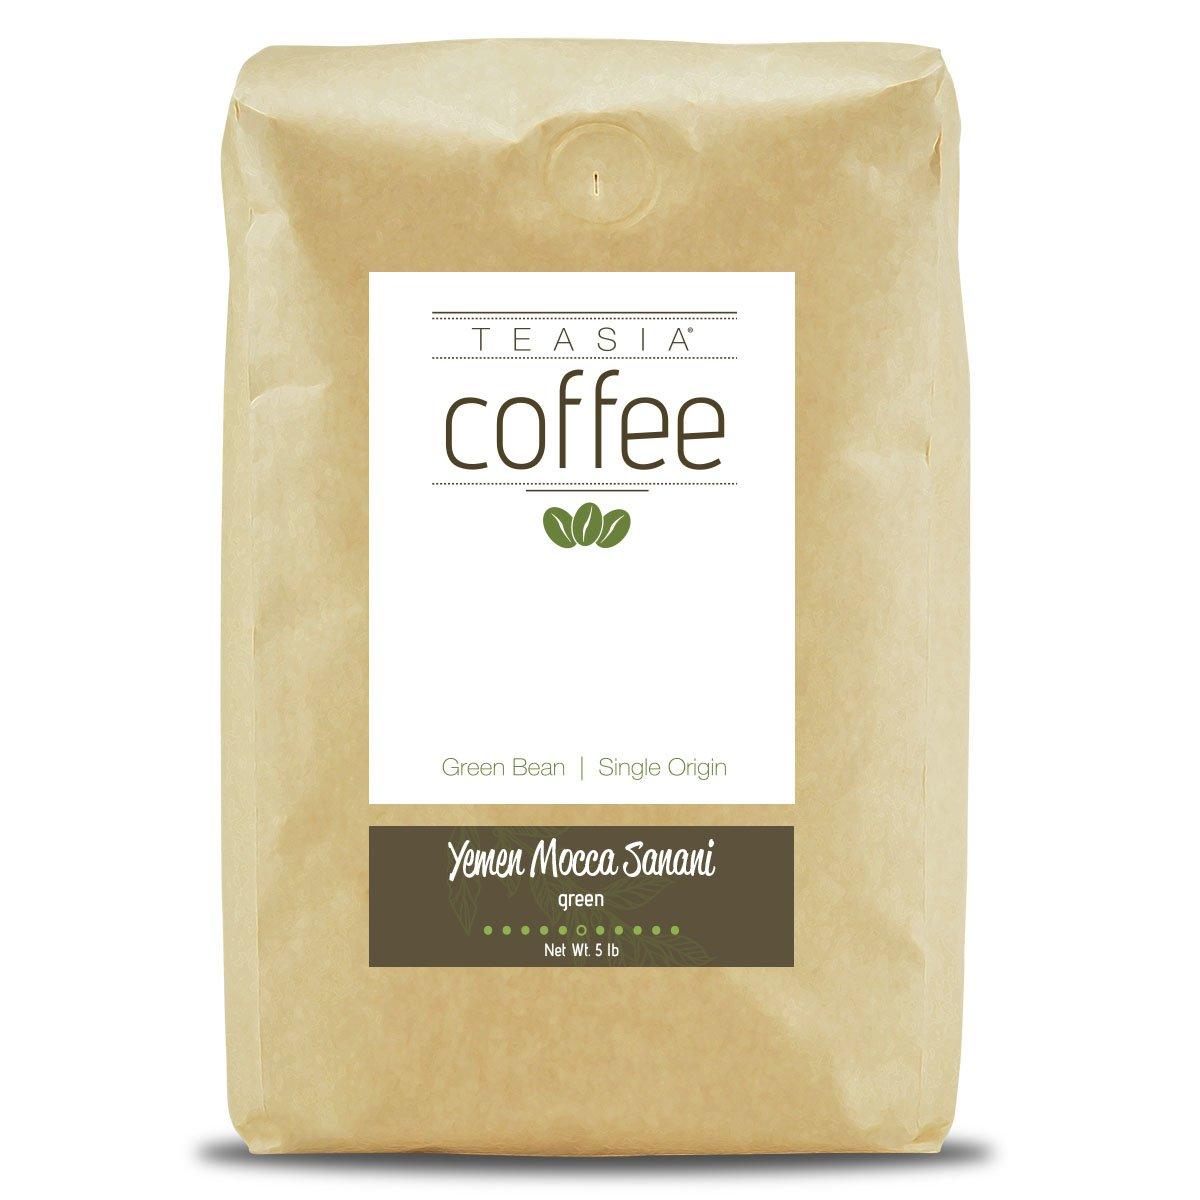 Teasia Coffee, Yemen Mocca Sanani, Single Origin, Green Unroasted Whole Coffee Beans, 5-Pound Bag